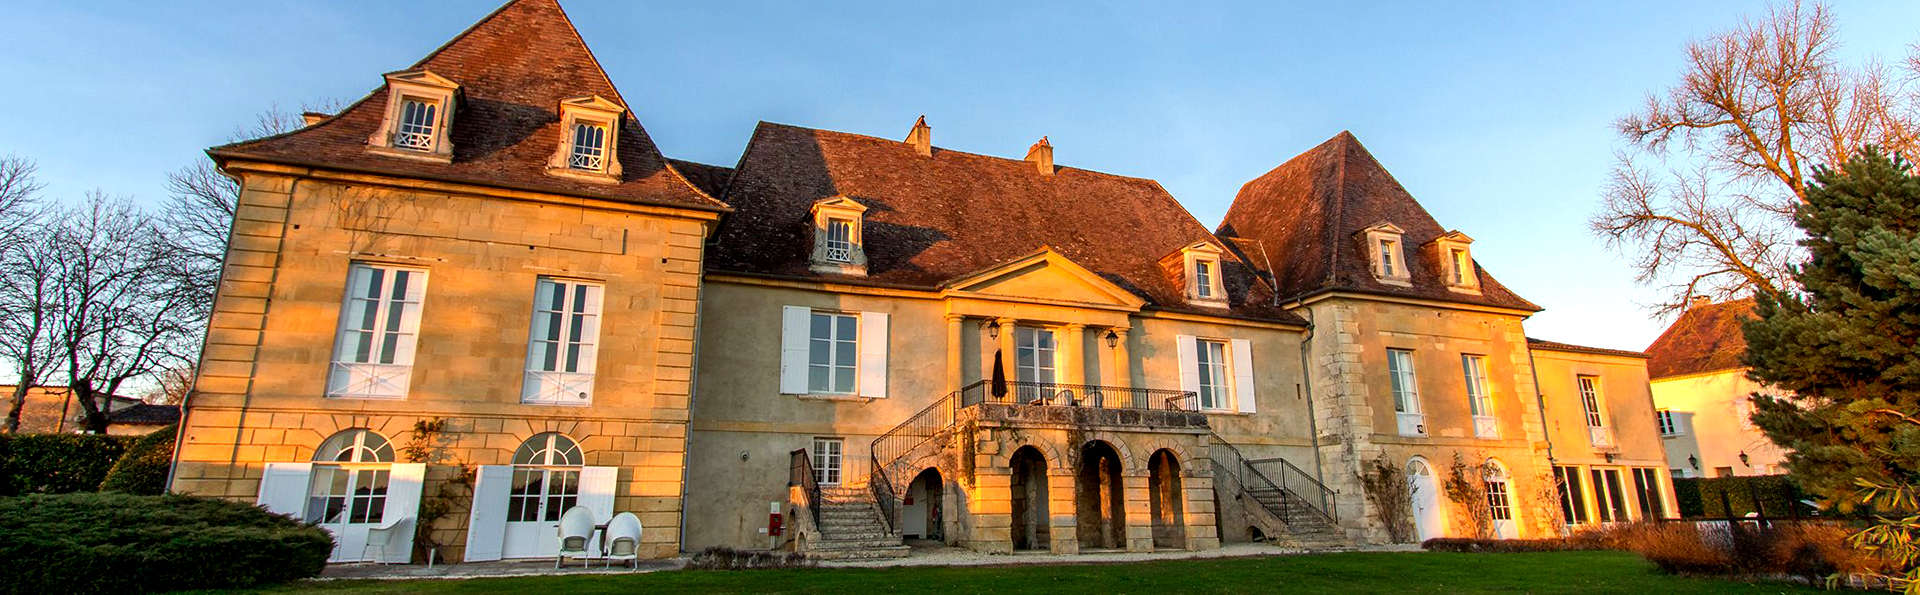 Château Les Merles - Edit_Front4.jpg